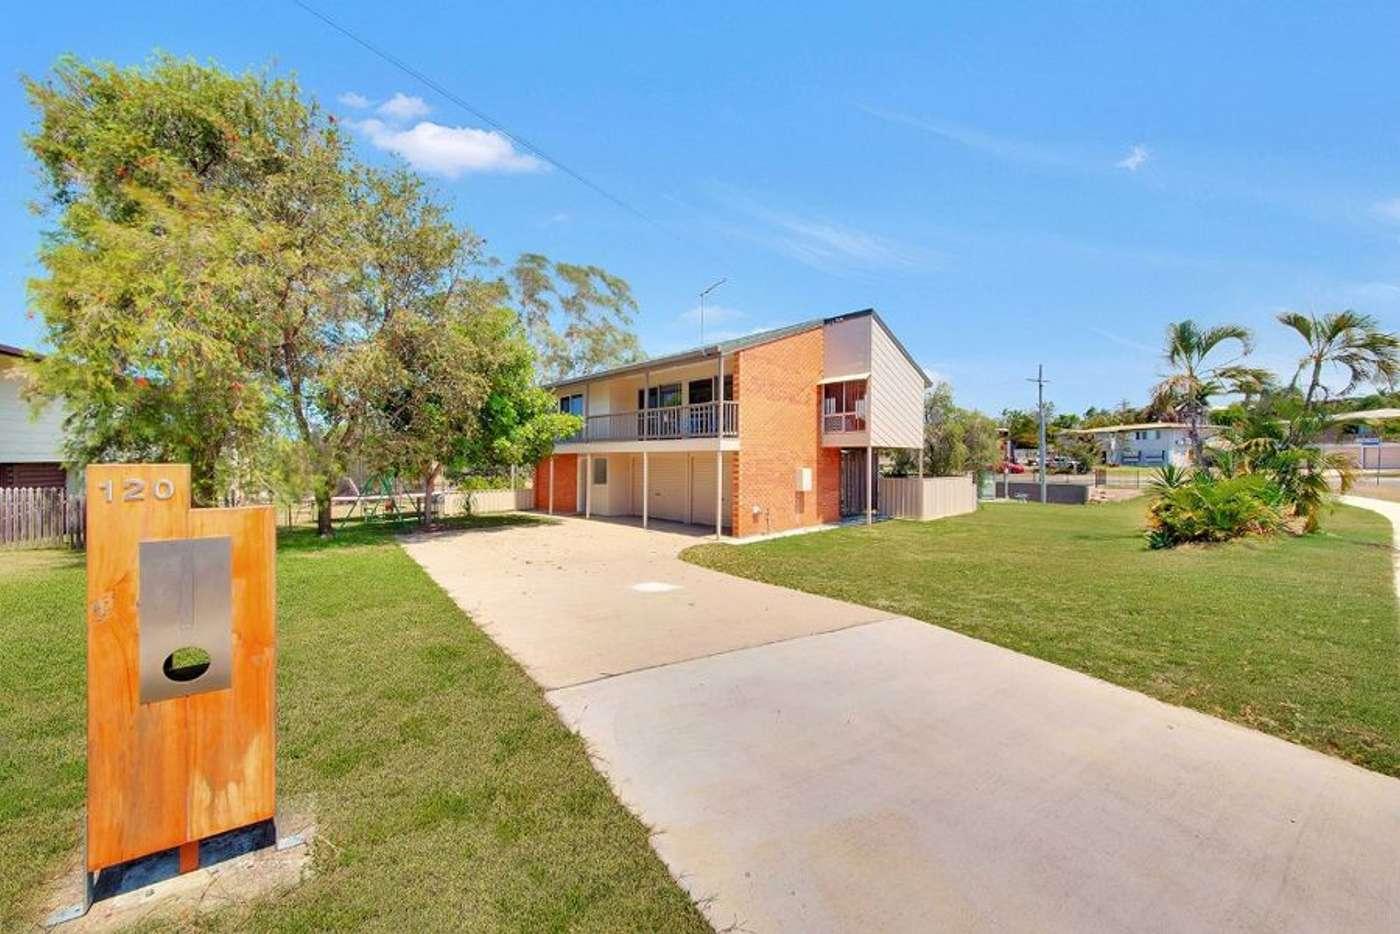 Main view of Homely house listing, 120 Malpas Street, Boyne Island QLD 4680